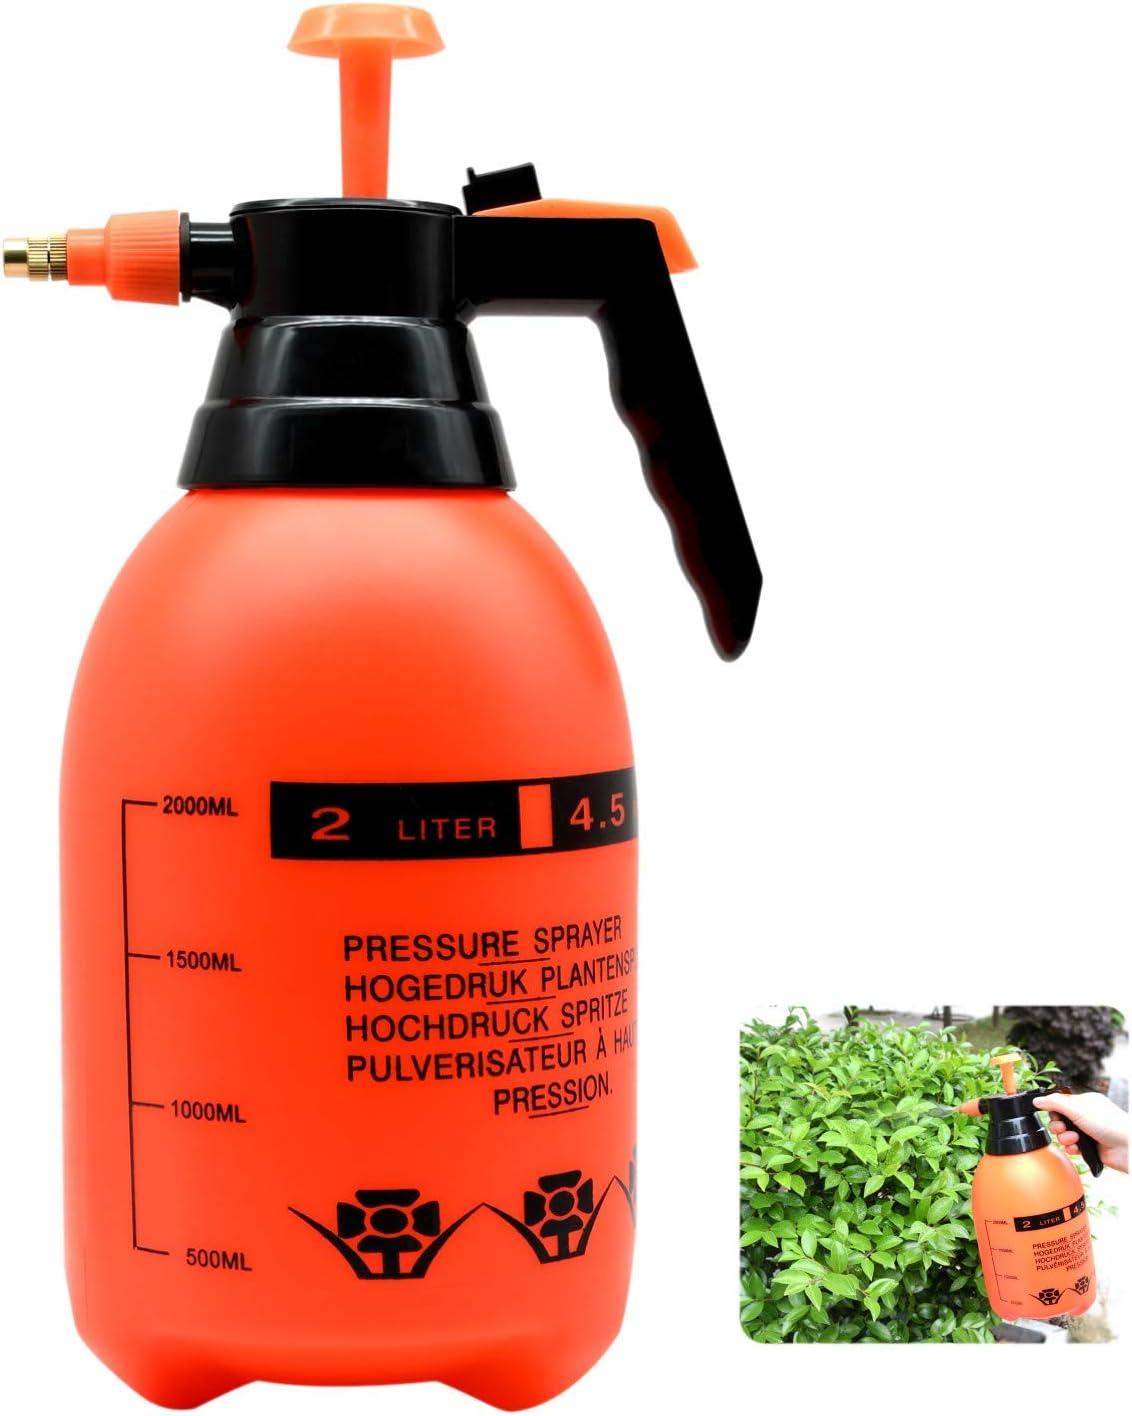 ZHONG AN Pulverizador 2L con Boquilla de latón Ajustable, atomizador de Bomba Blumensprüher, Plantas, hogar y jardín